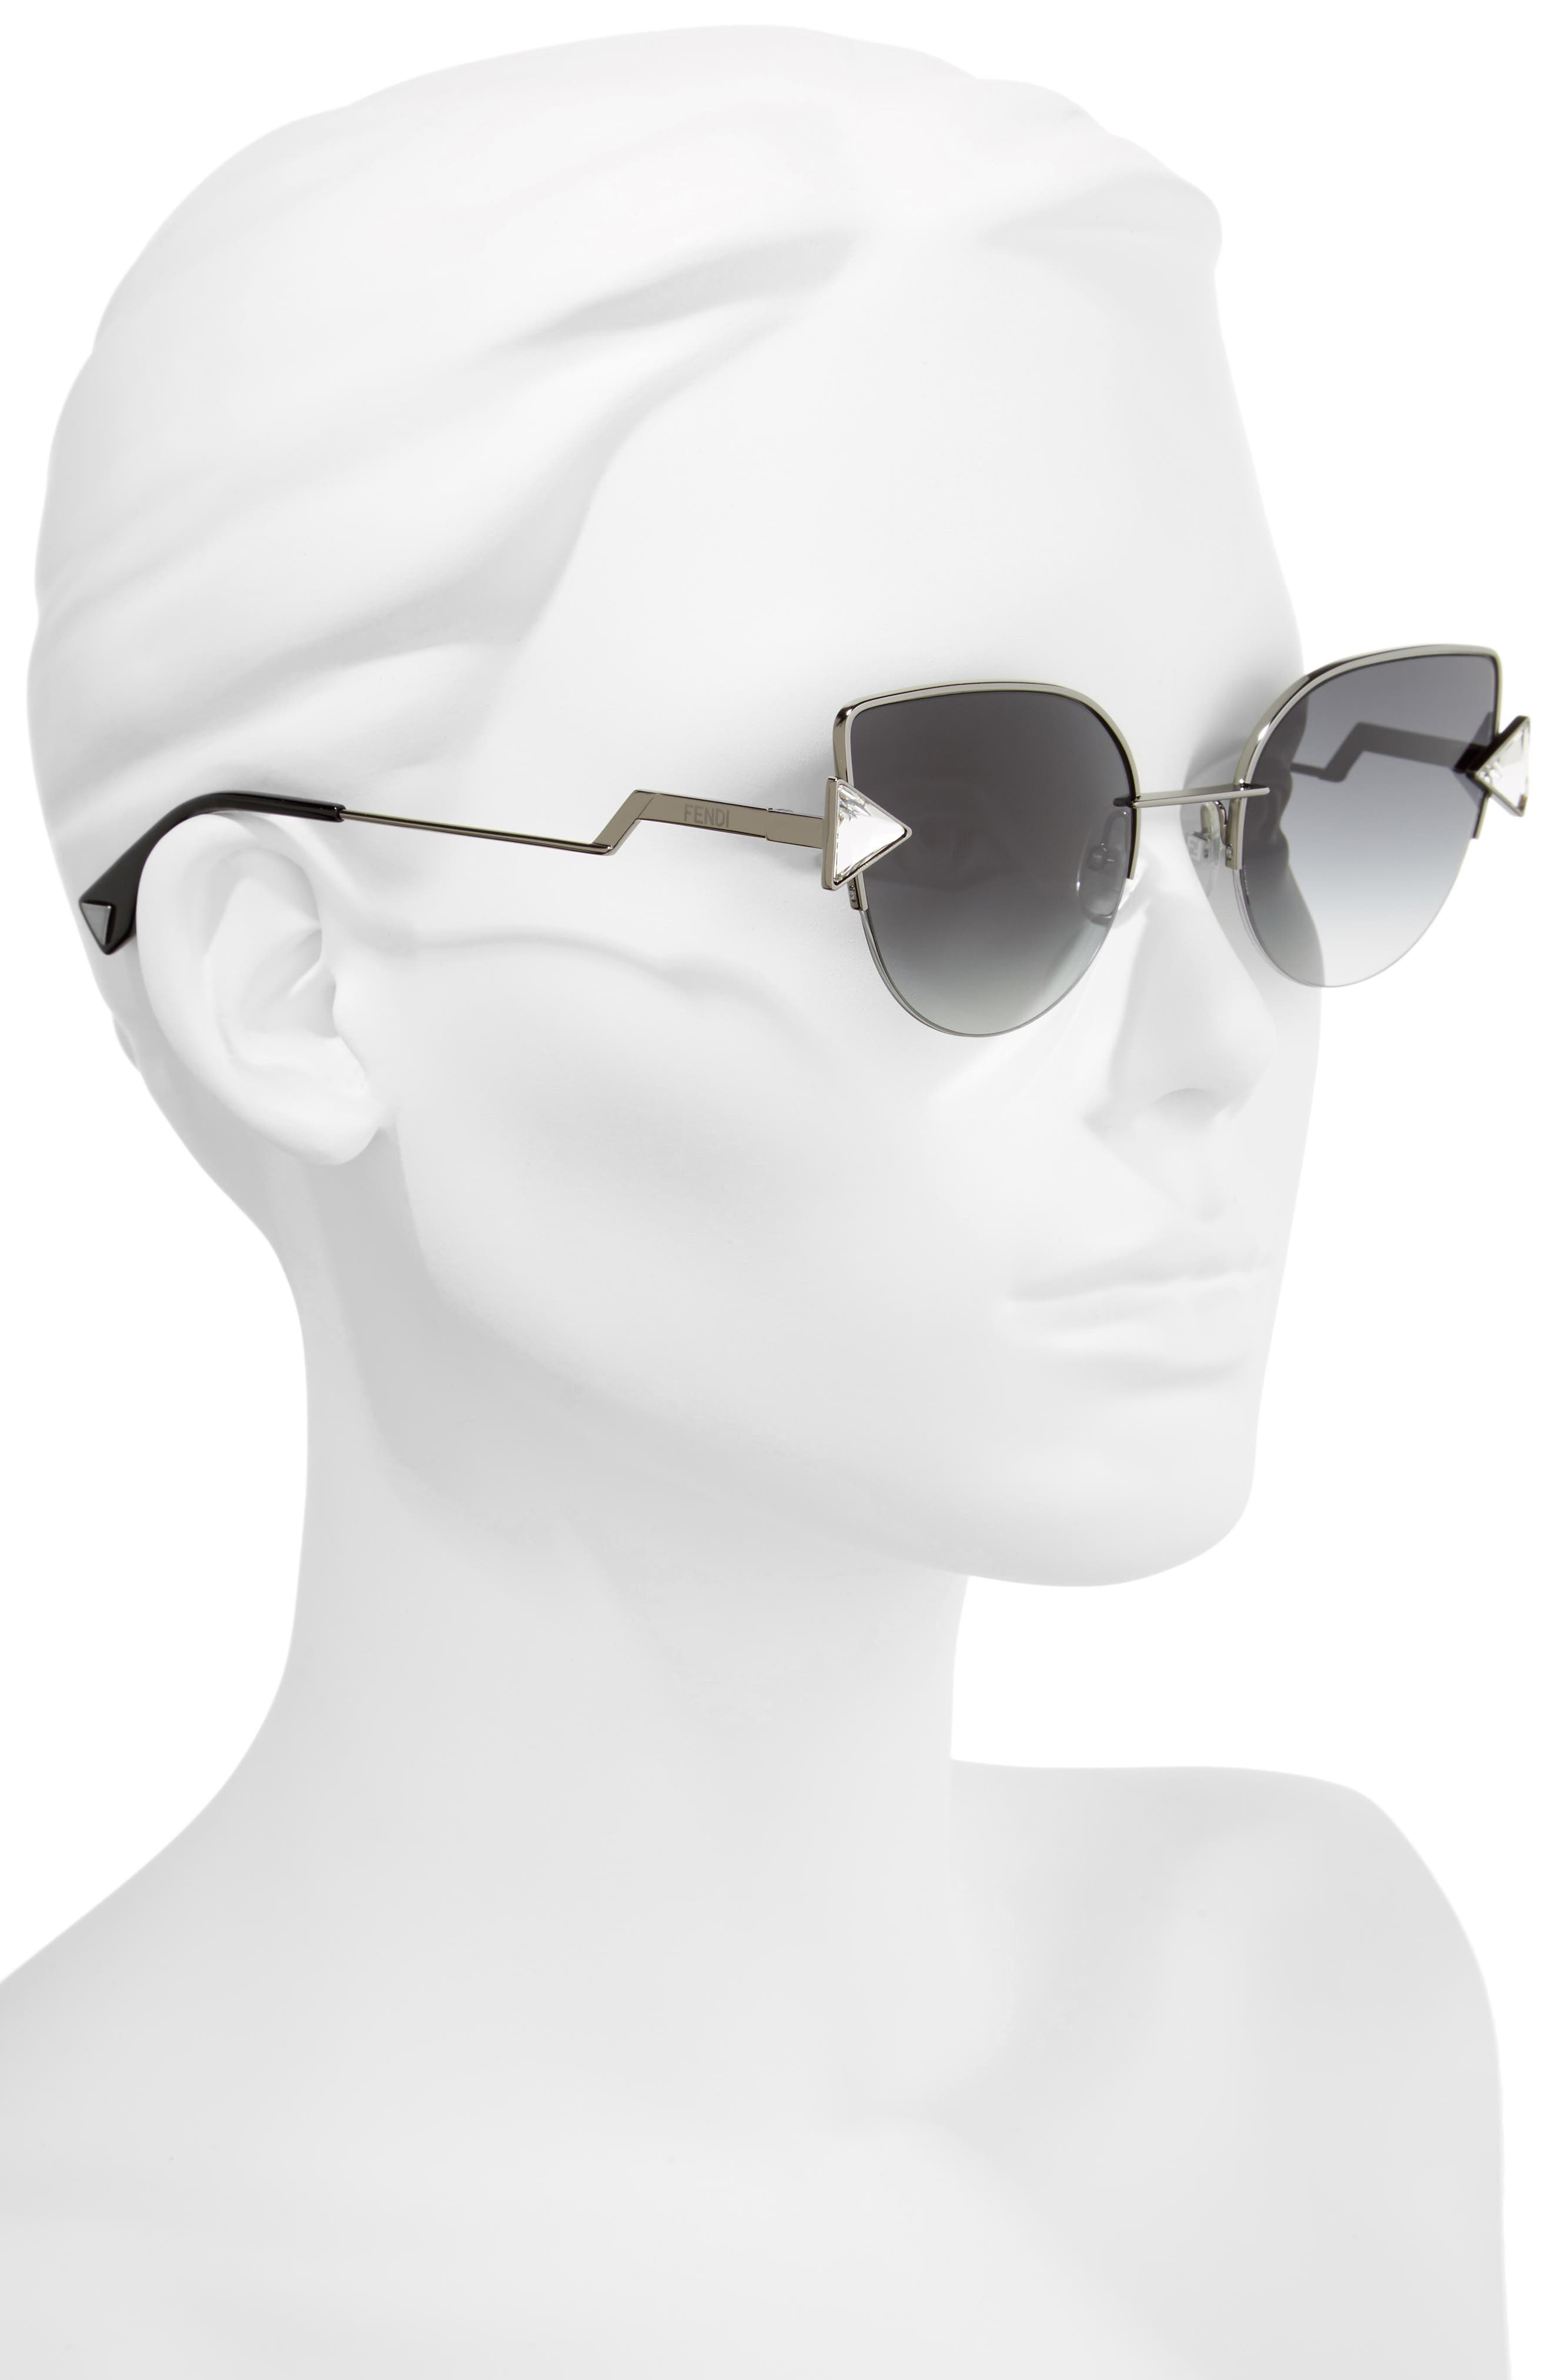 Rainbow 52mm Semi-Rimless Sunglasses,                             Alternate thumbnail 2, color,                             040